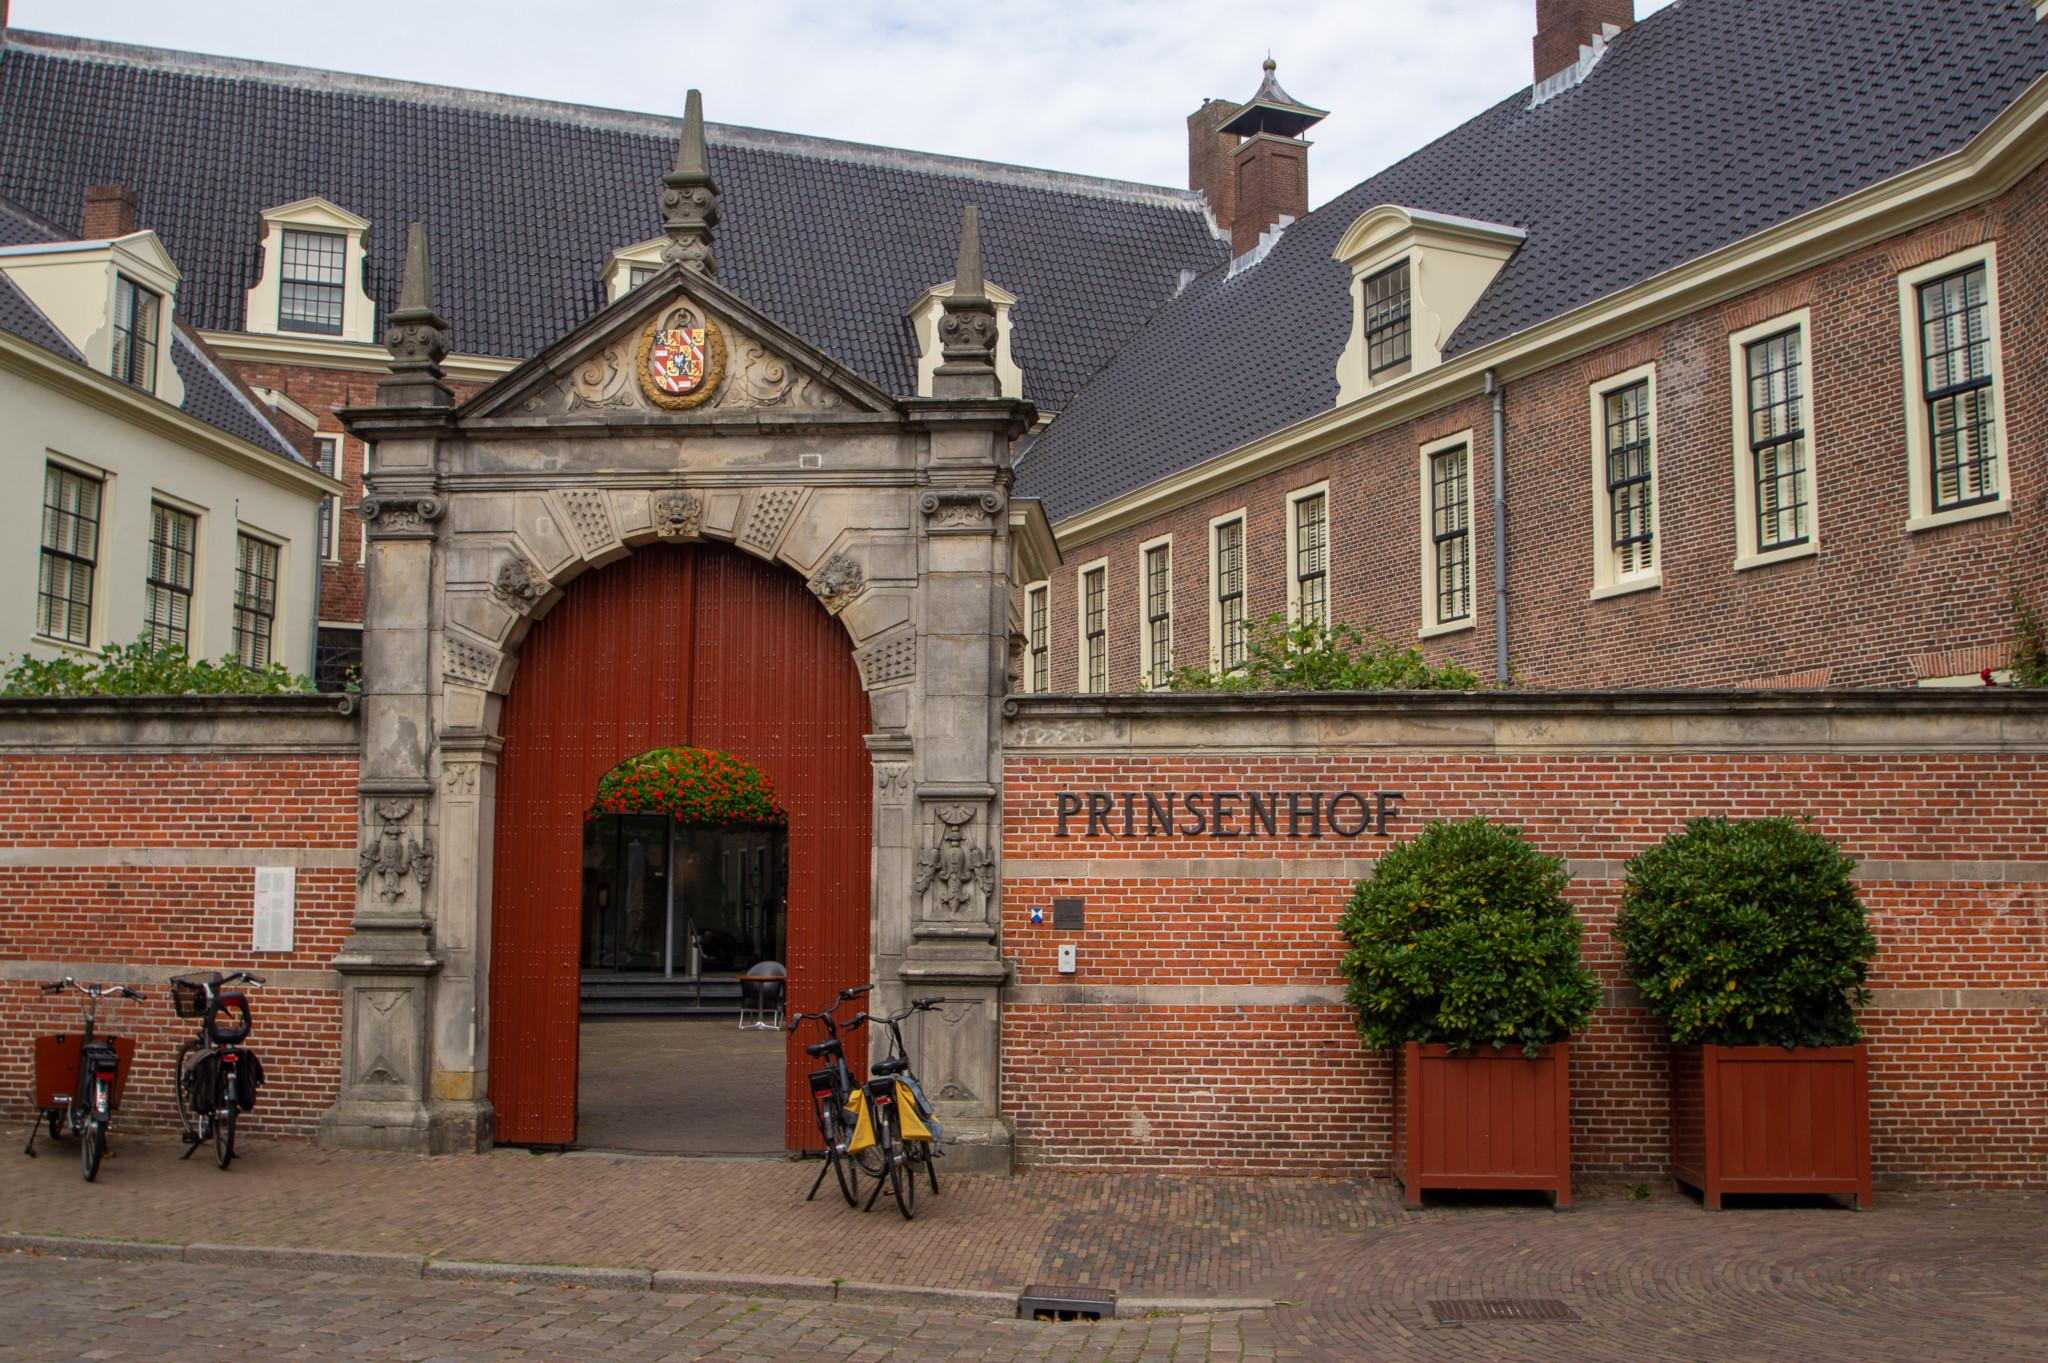 Prinsenhof in Groningen, Holland